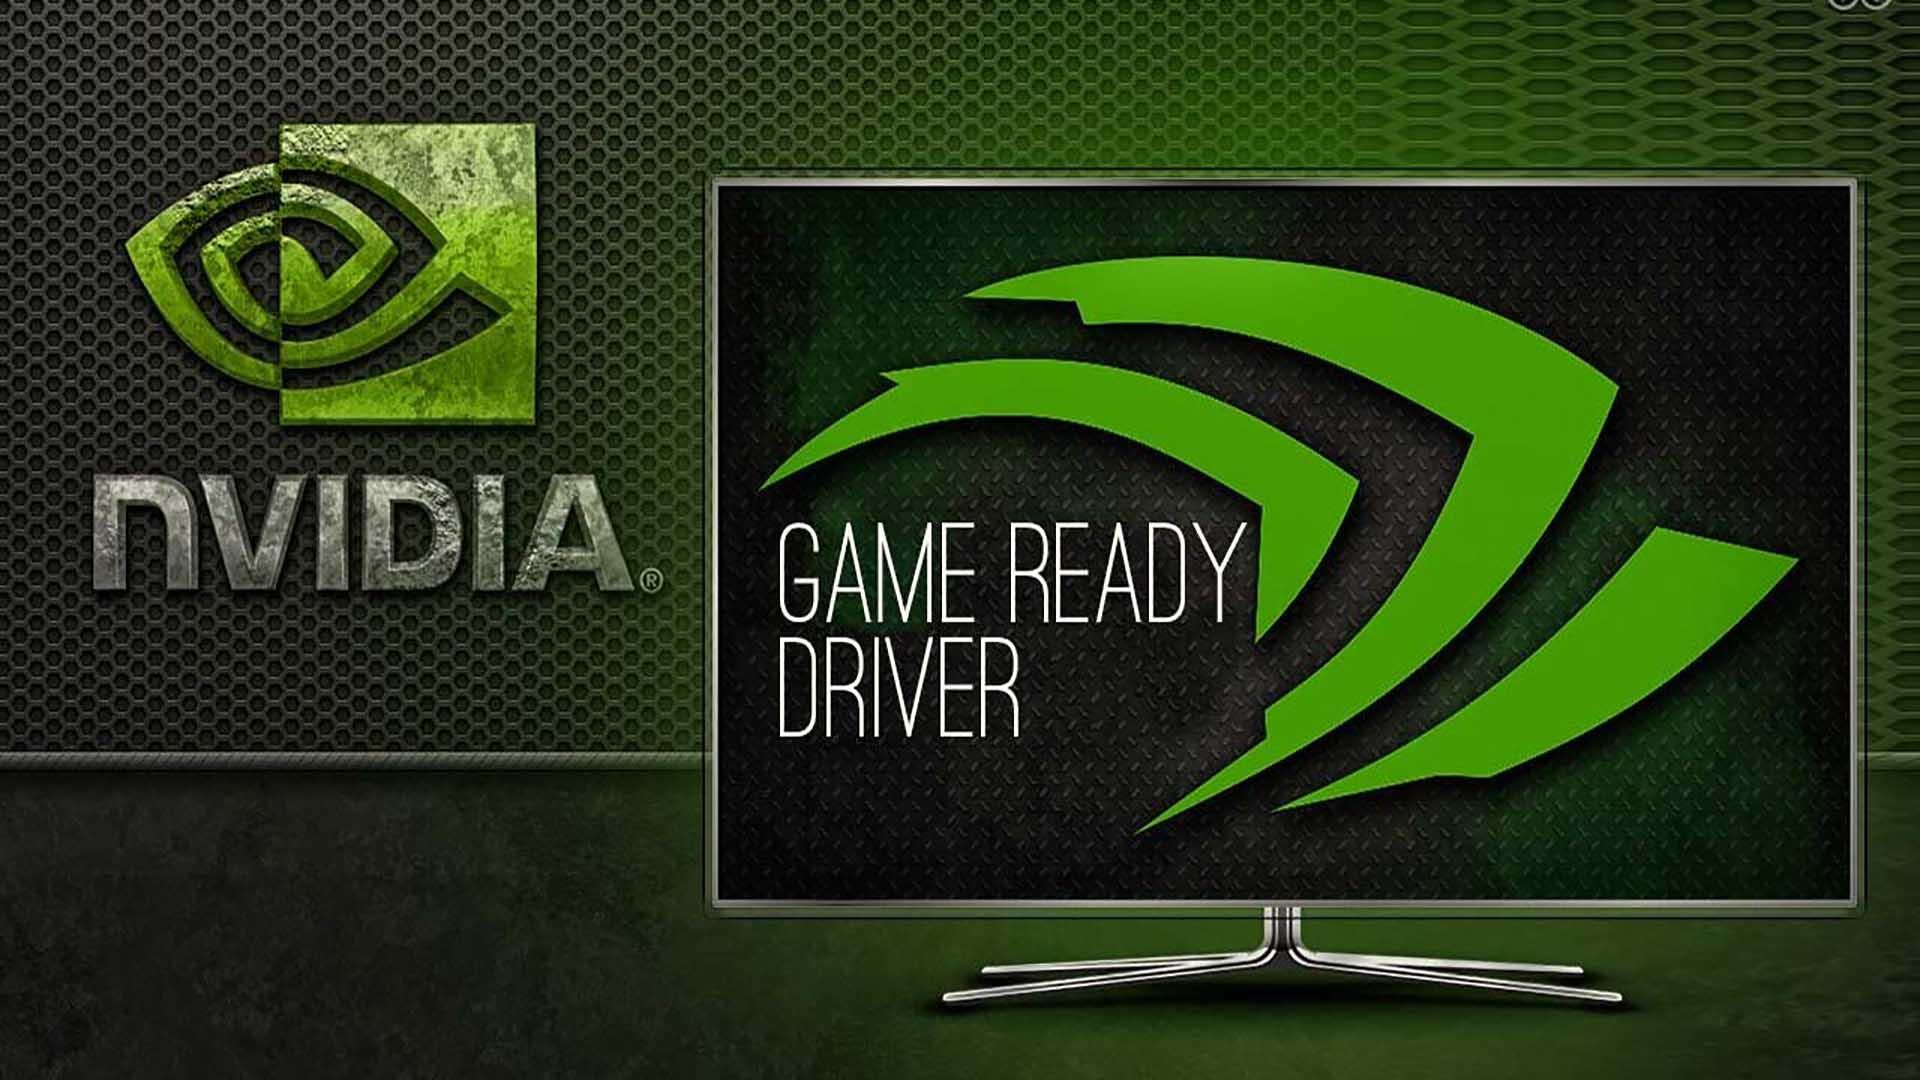 nvidia game ready drivers 436.30